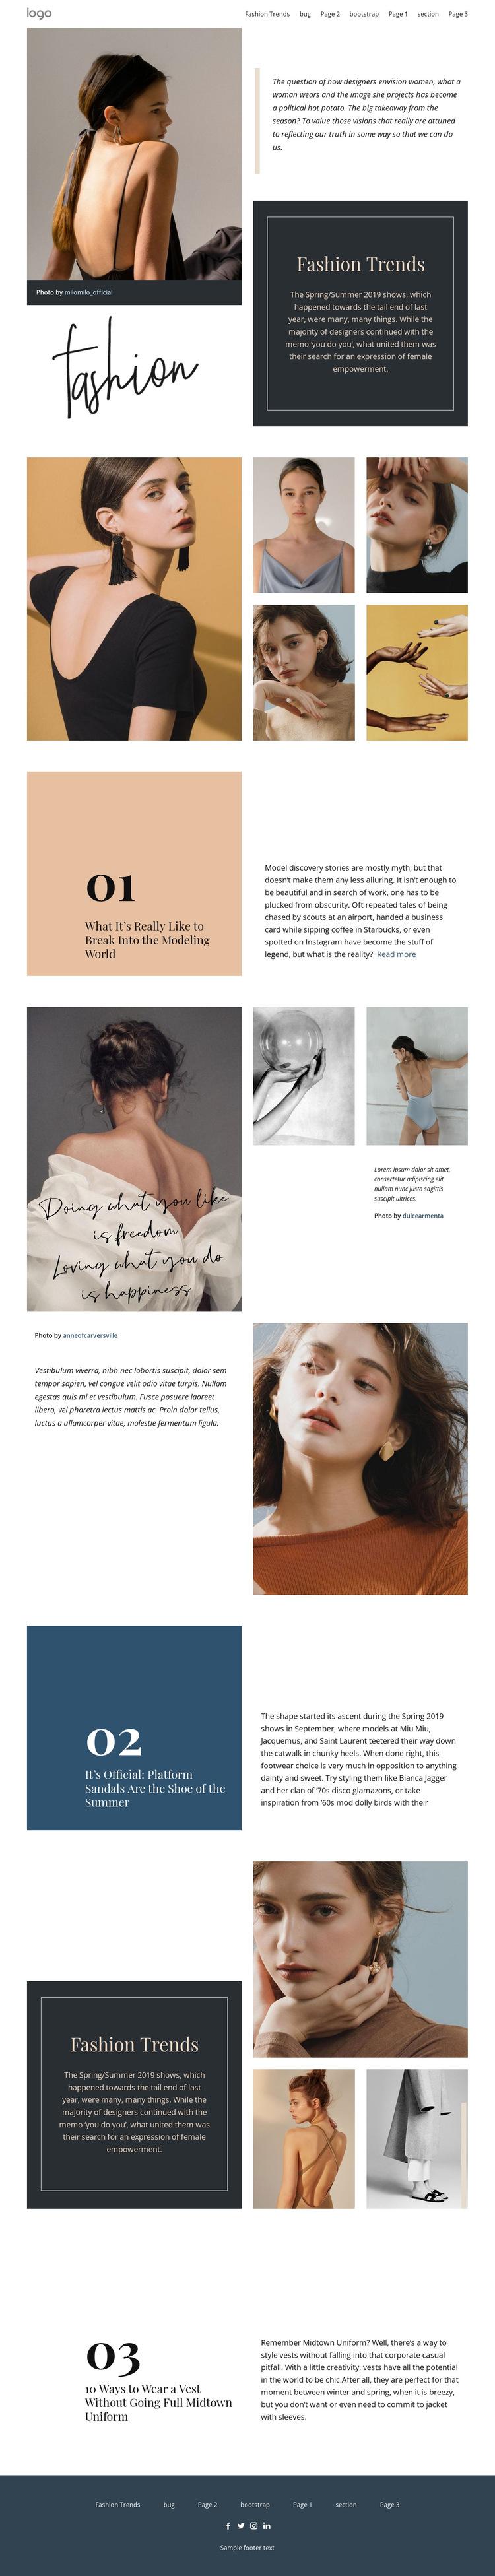 Designer vision of fashion HTML5 Template